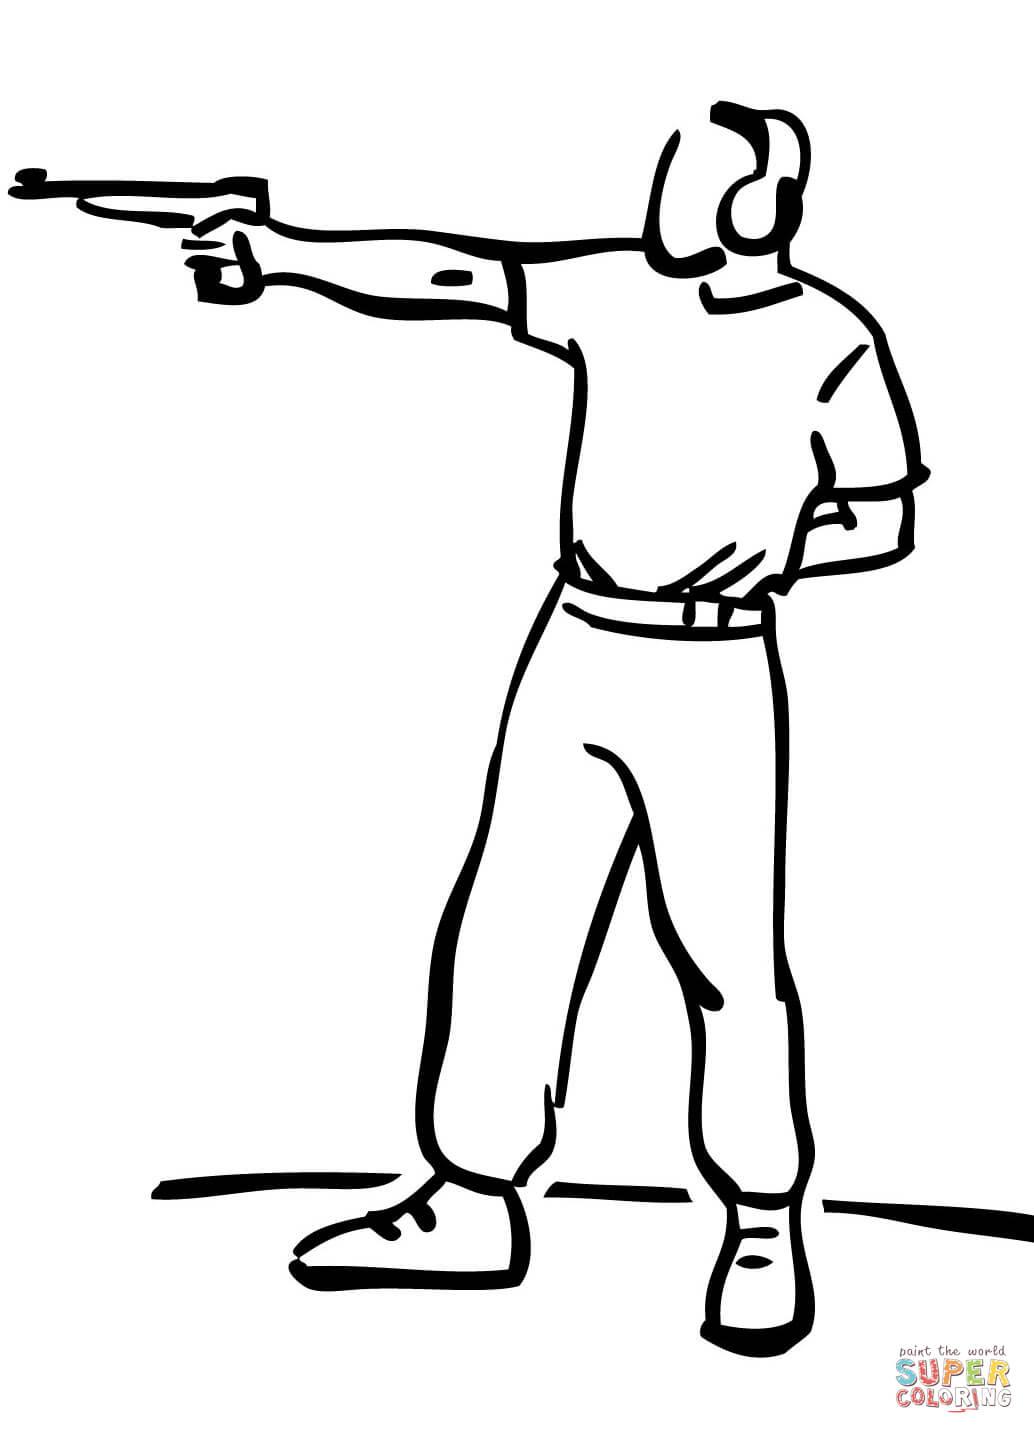 Pistol Target Shooting Coloring Page